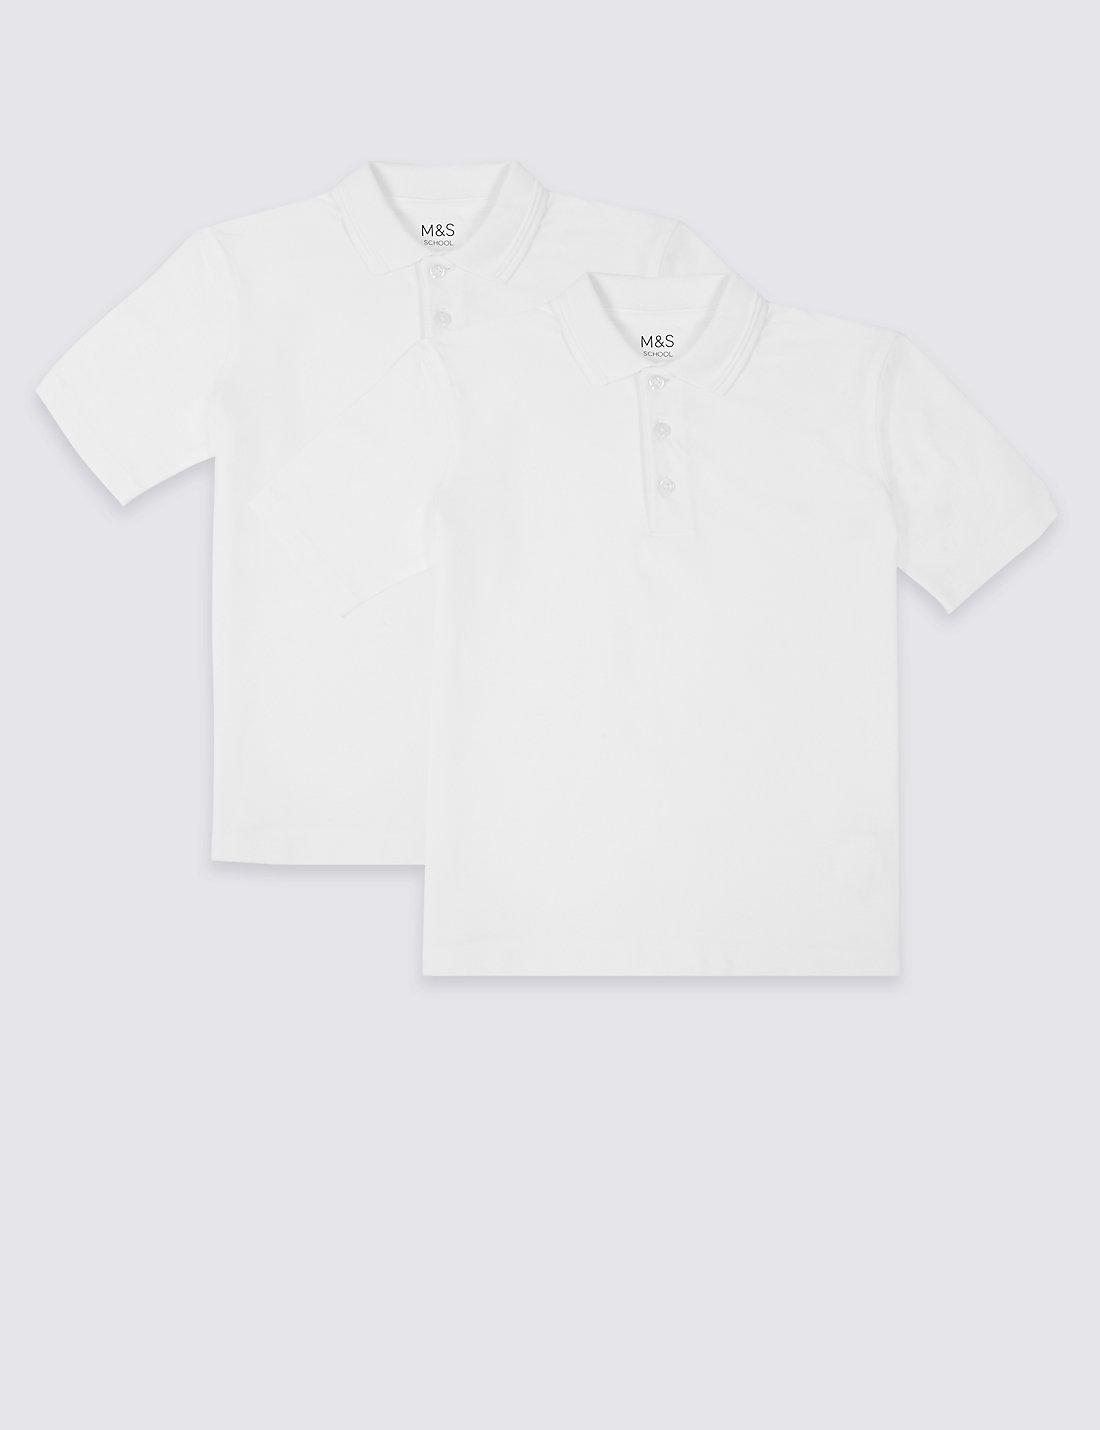 Polo shirt design editor - 2 Pack Skin Kind Unisex Pure Cotton Polo Shirts